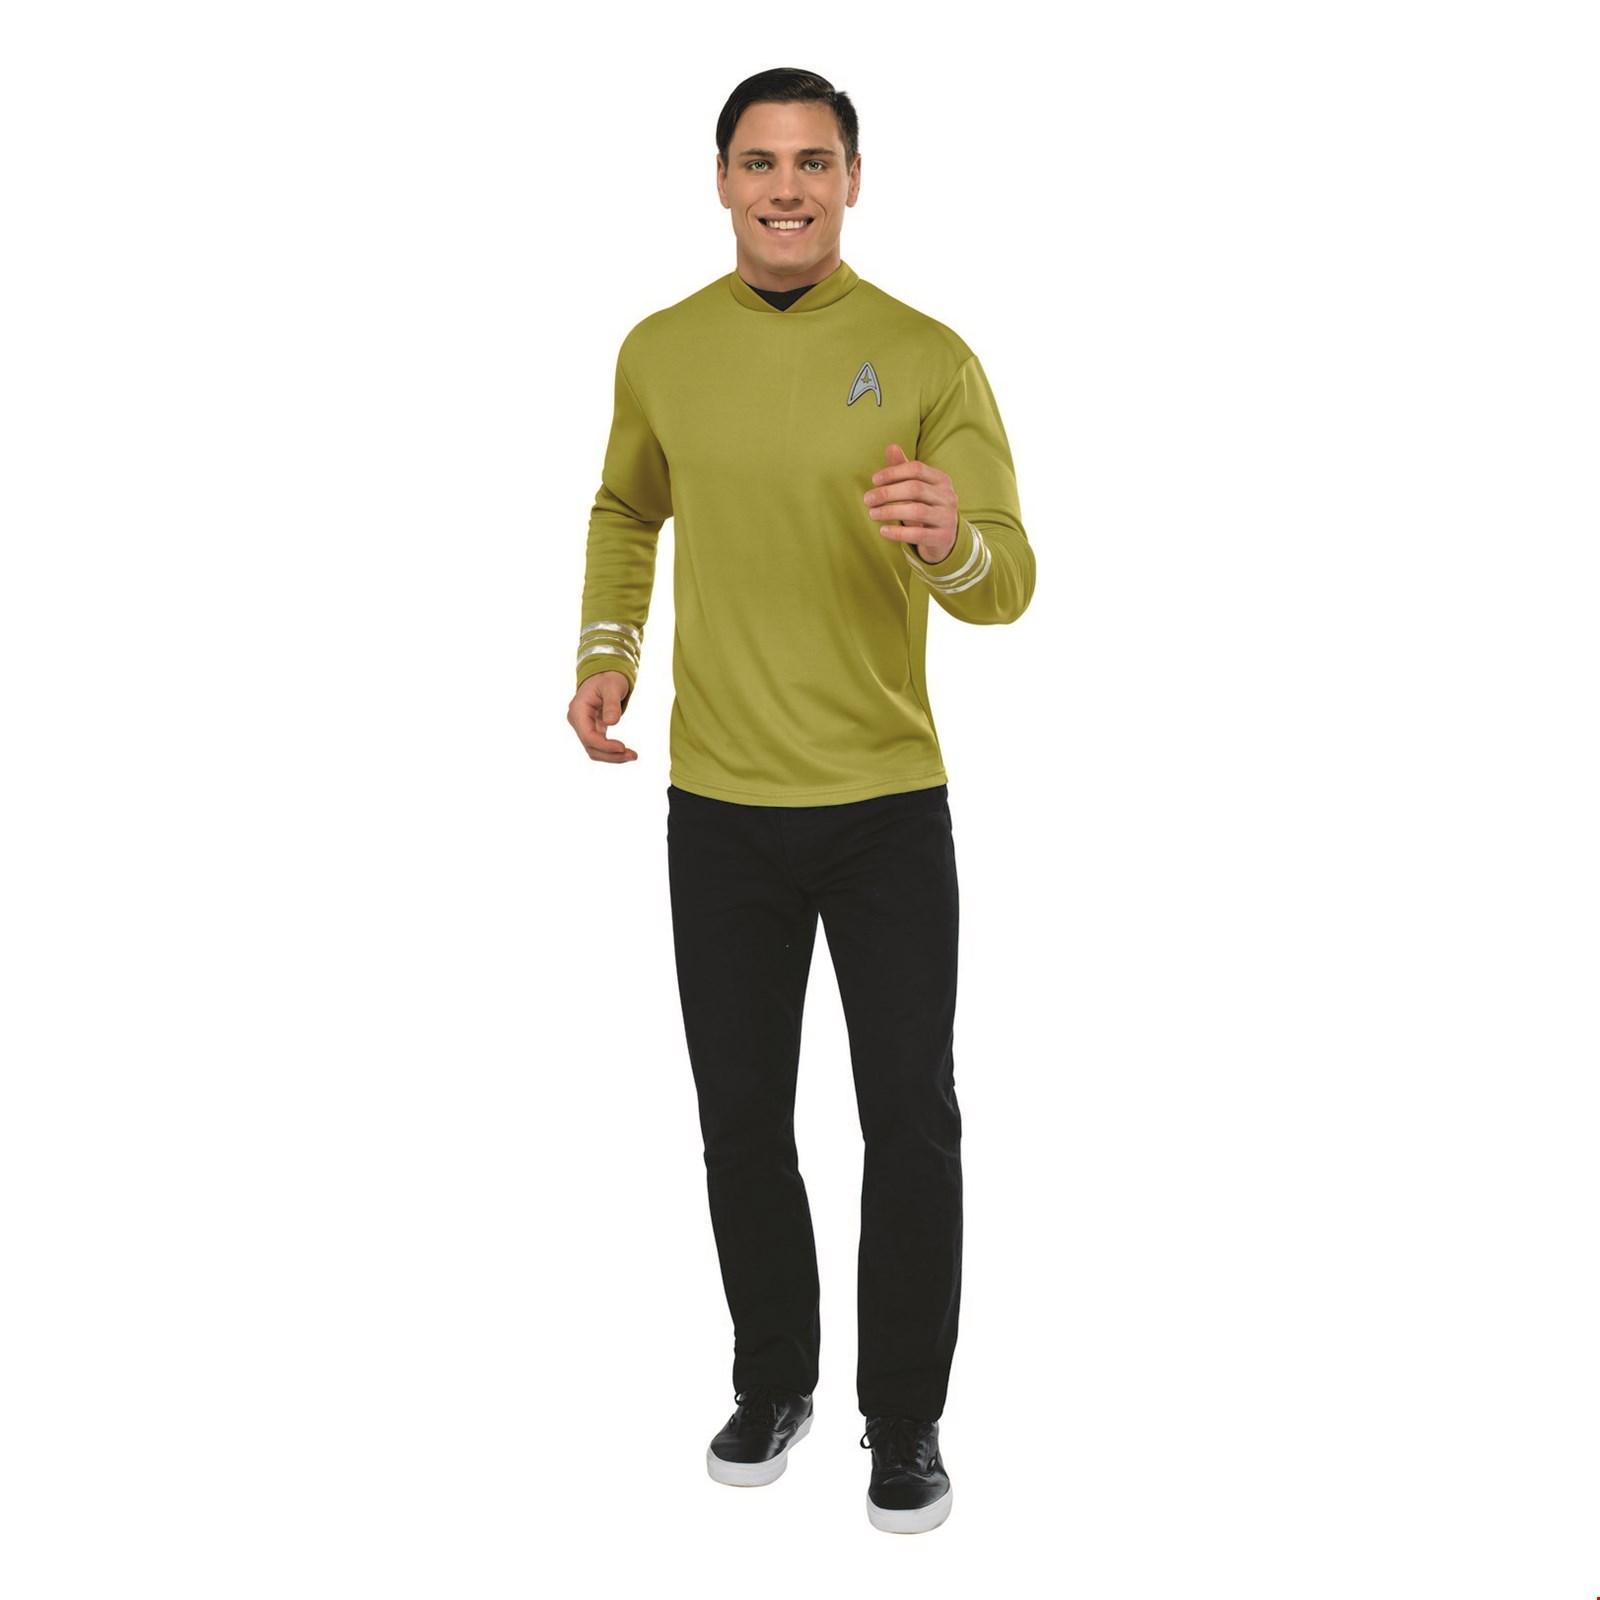 Star Trek Mens Deluxe Captain Kirk Halloween Costume